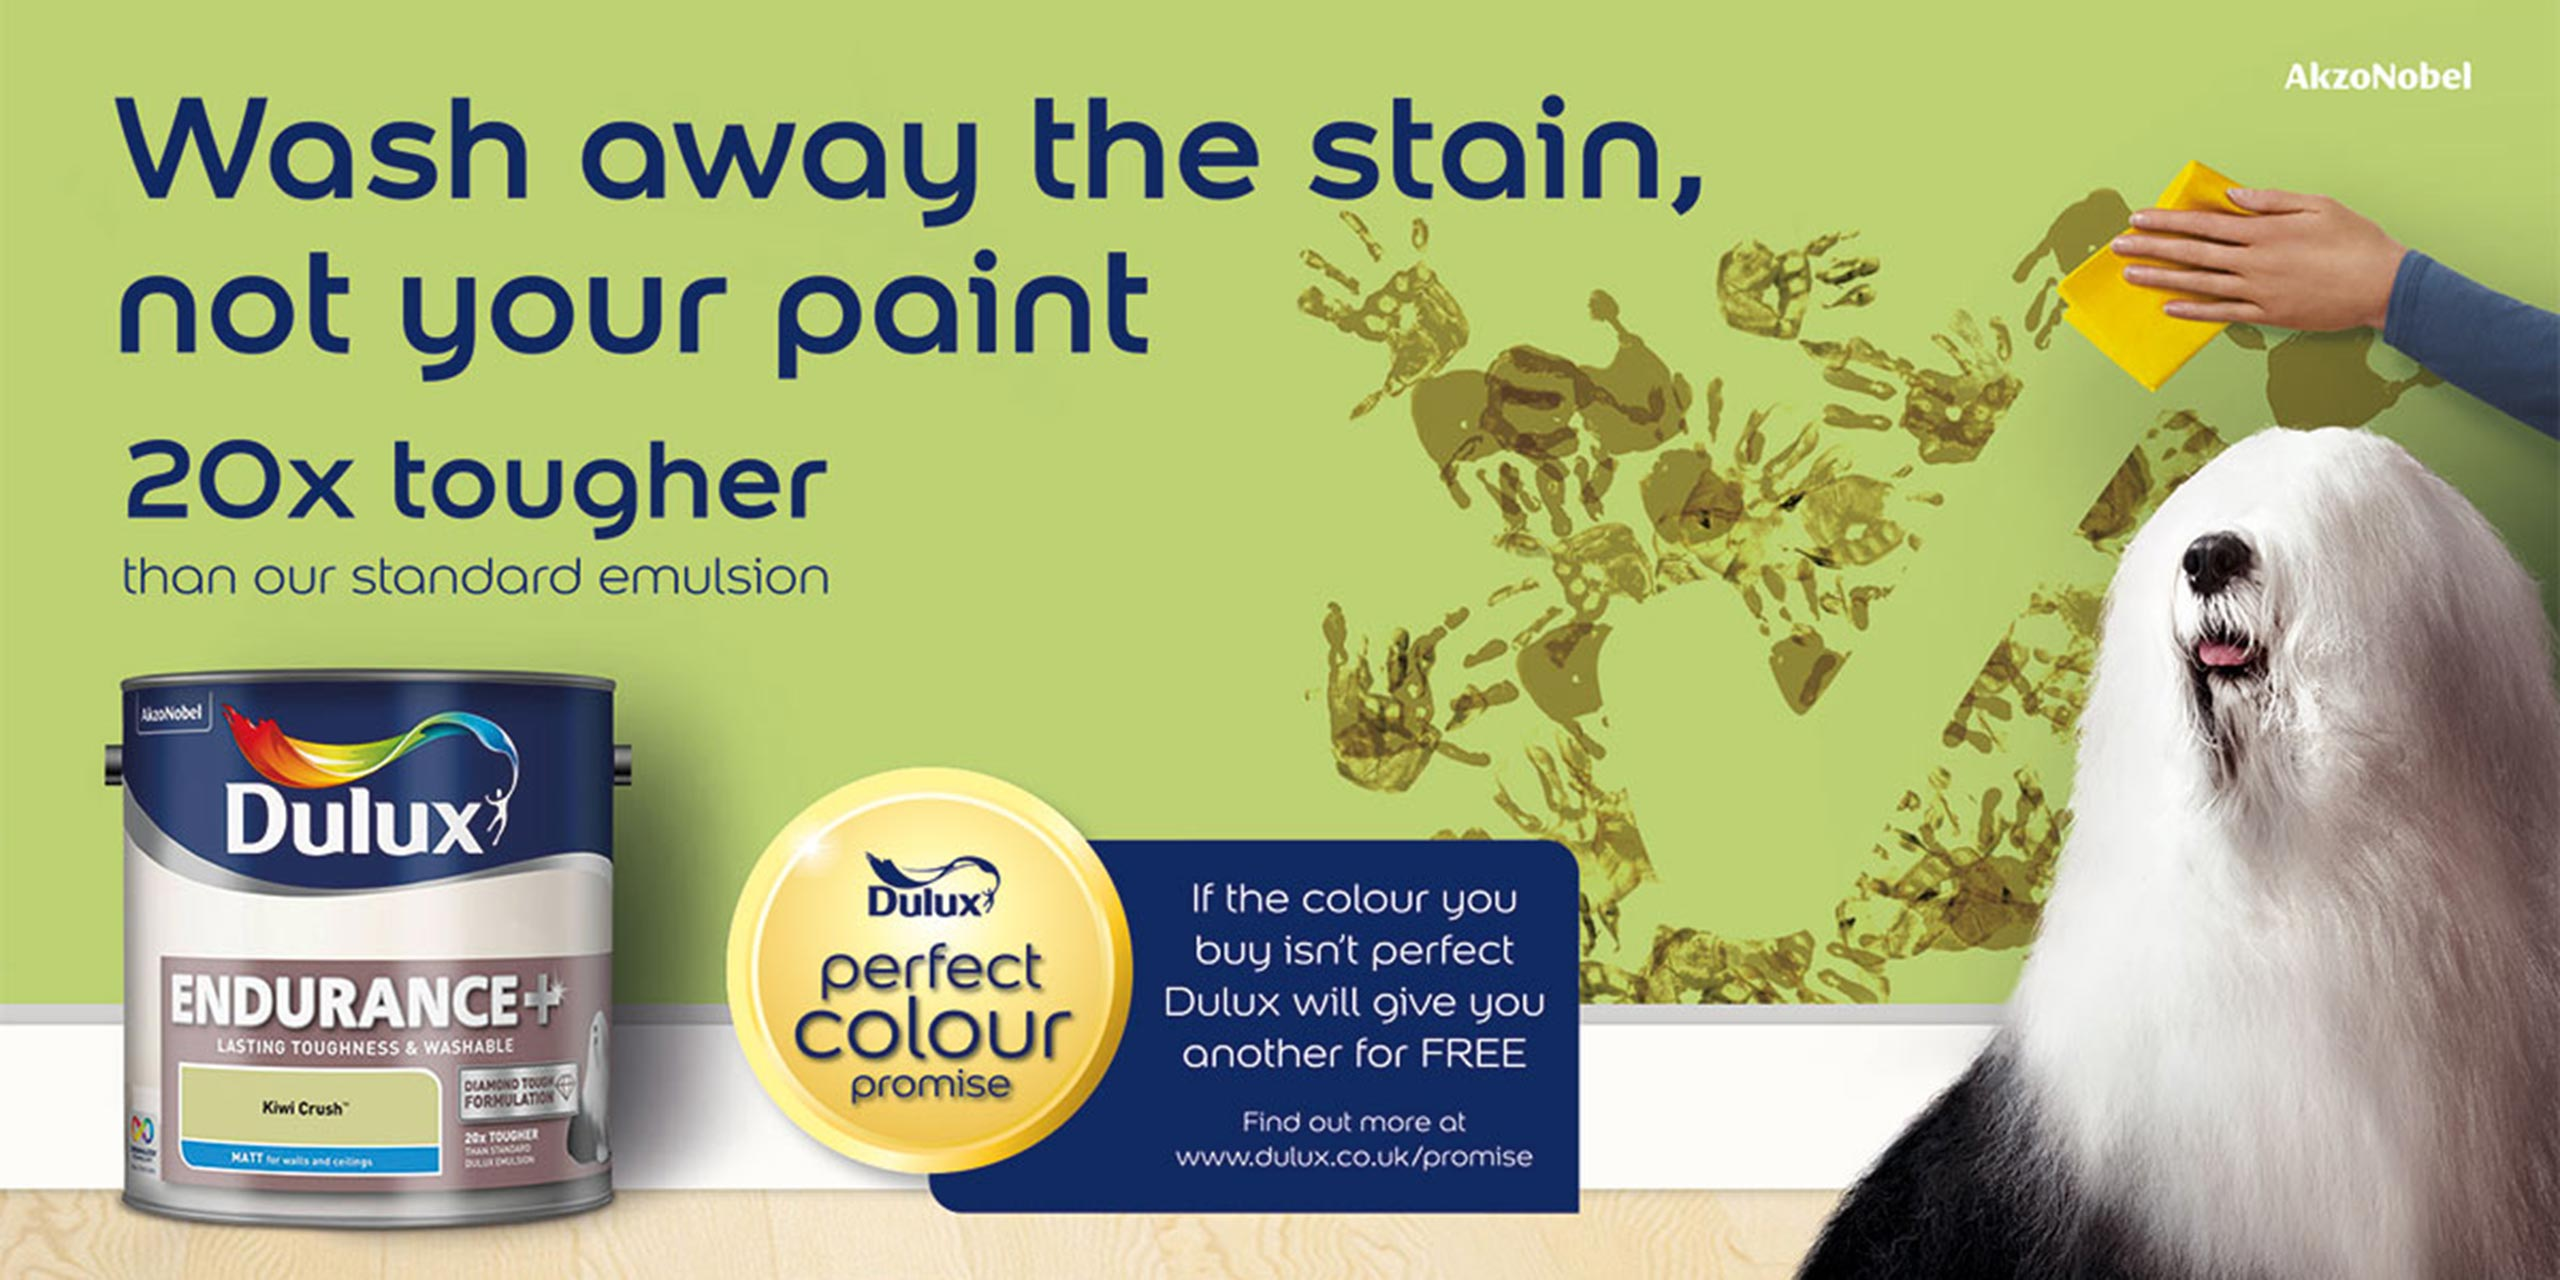 Dulux Endurance Campaign POS Retail Design - Cirka Creative